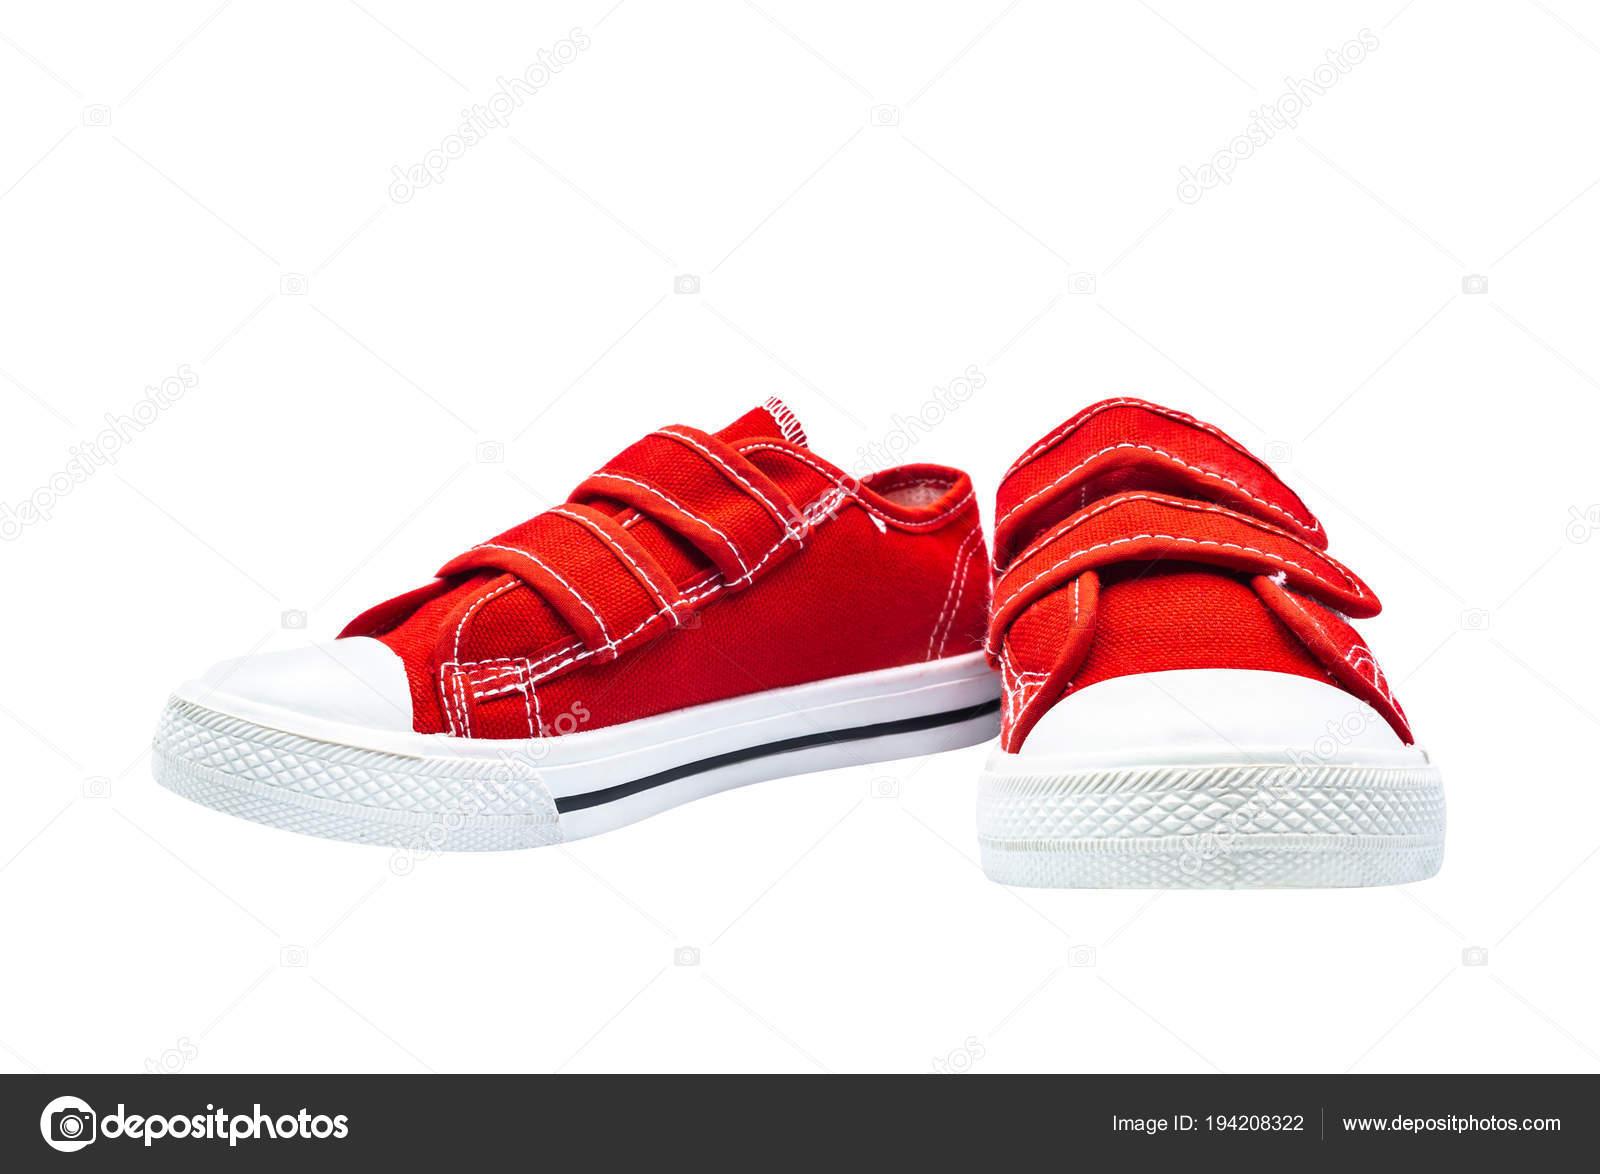 Par ZapatosDel Deporte Marca Sin Moderno FotosNiños 9DI2HWE